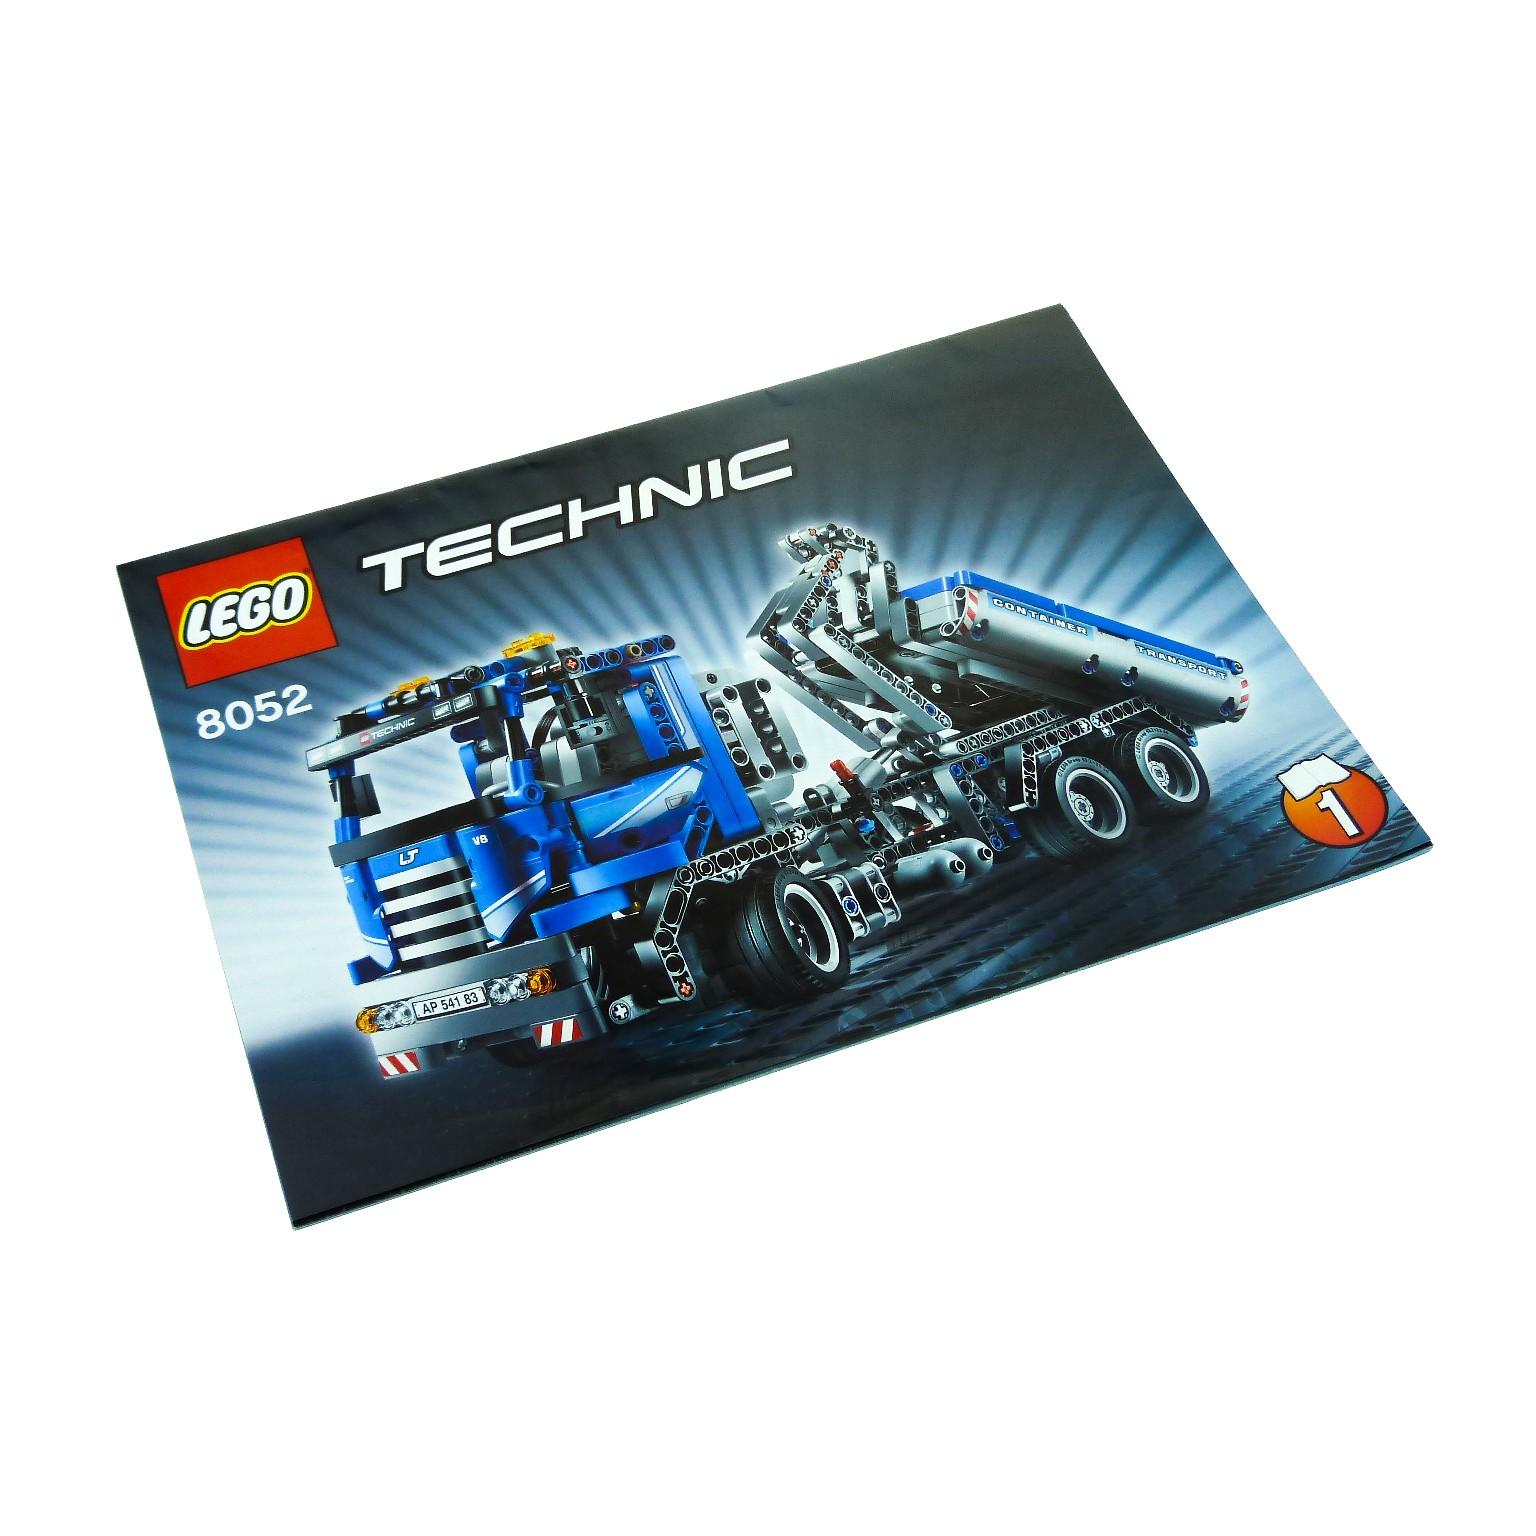 1 X Lego Brick Instructions For Set Technic Model Construction